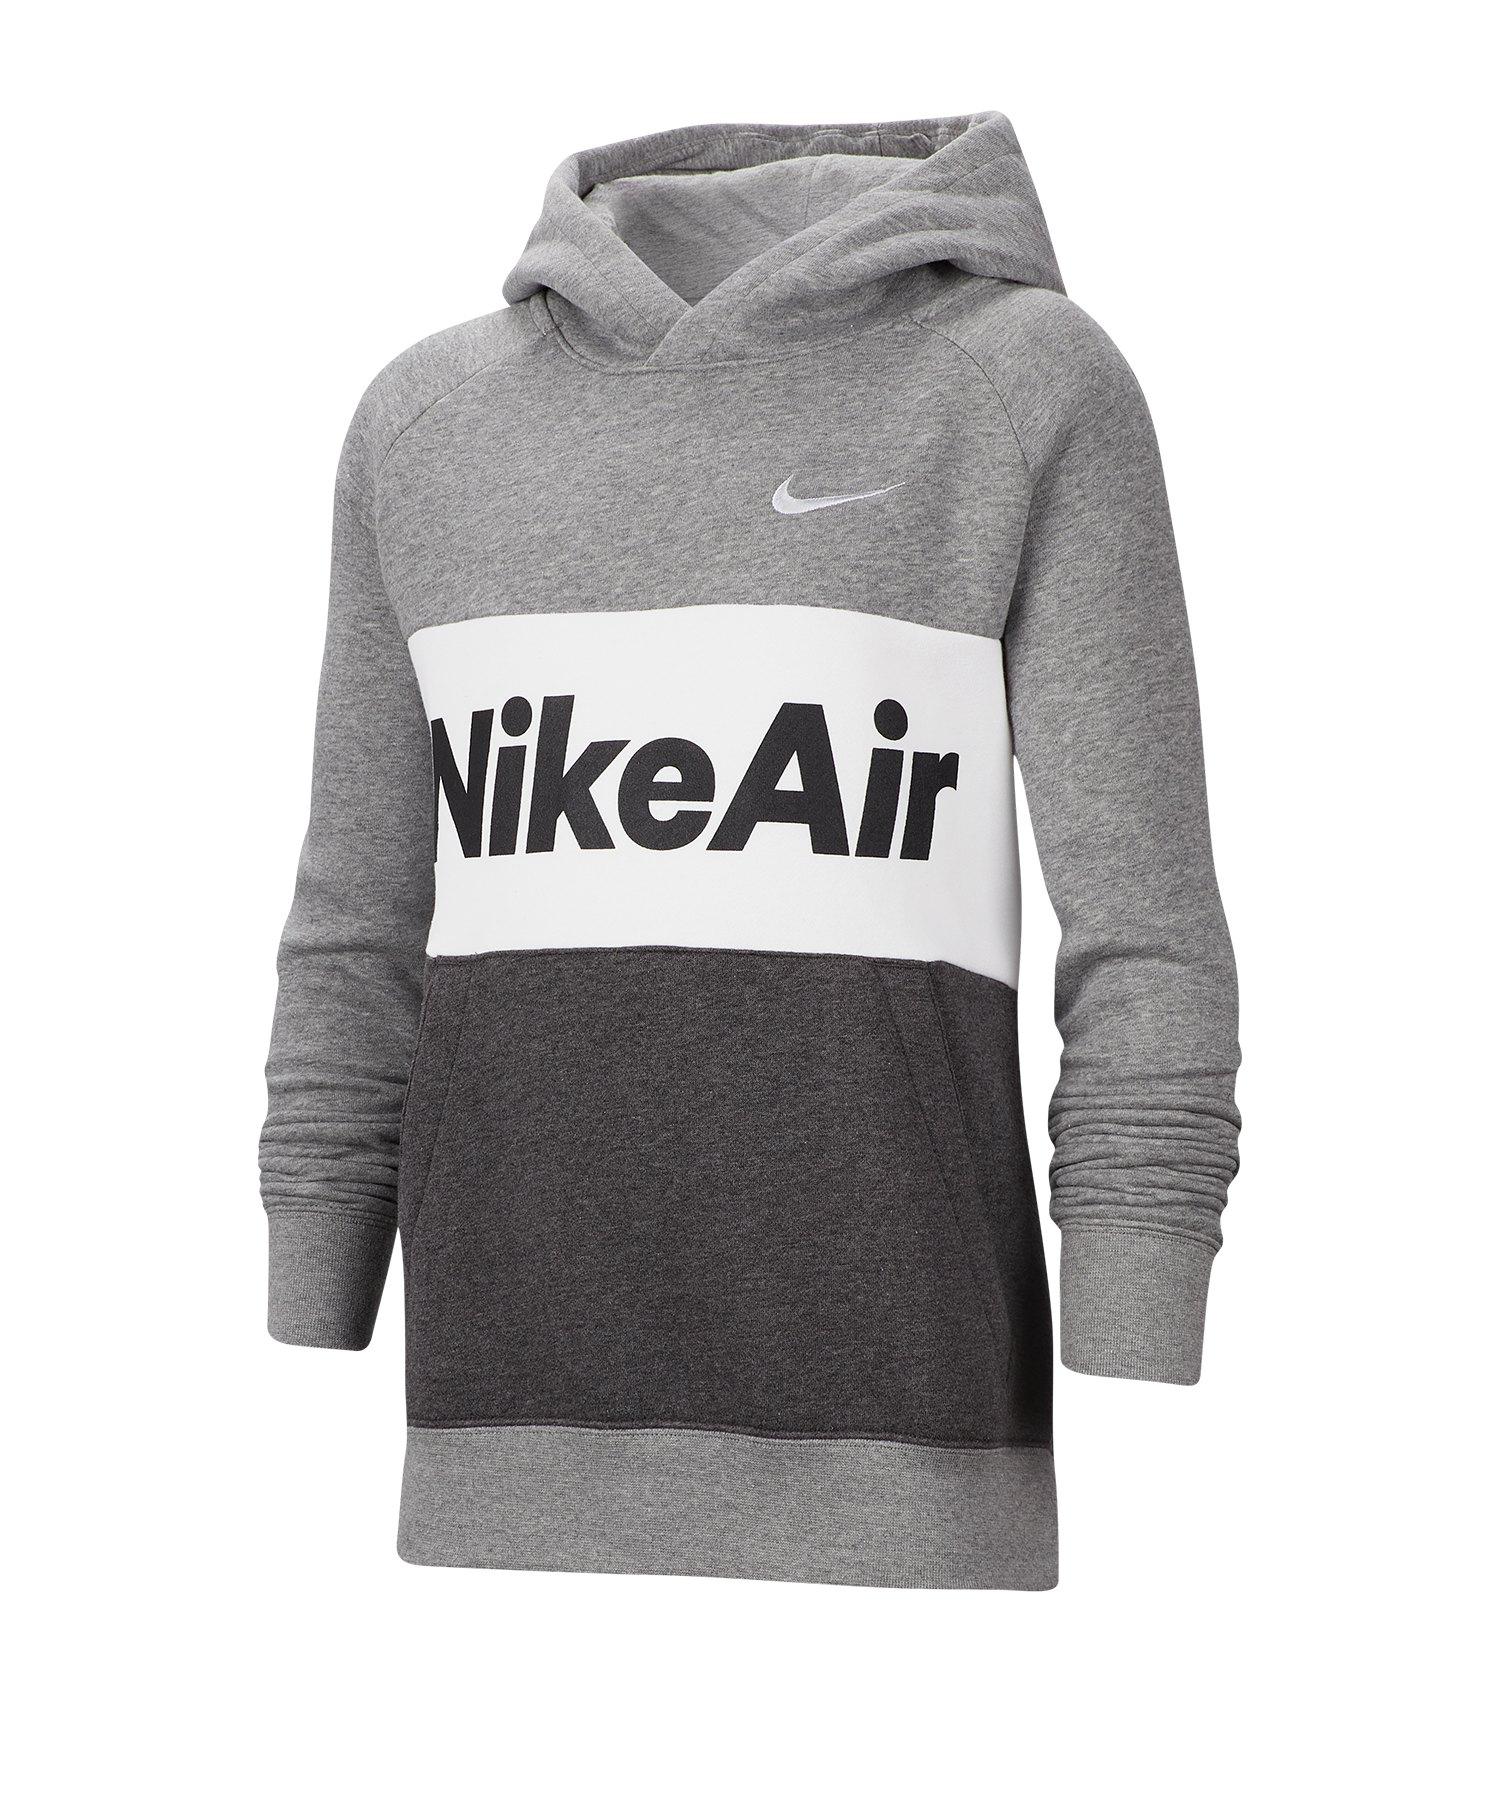 Nike Air Hoody Kapuzenpullover Kids Grau F063 - grau